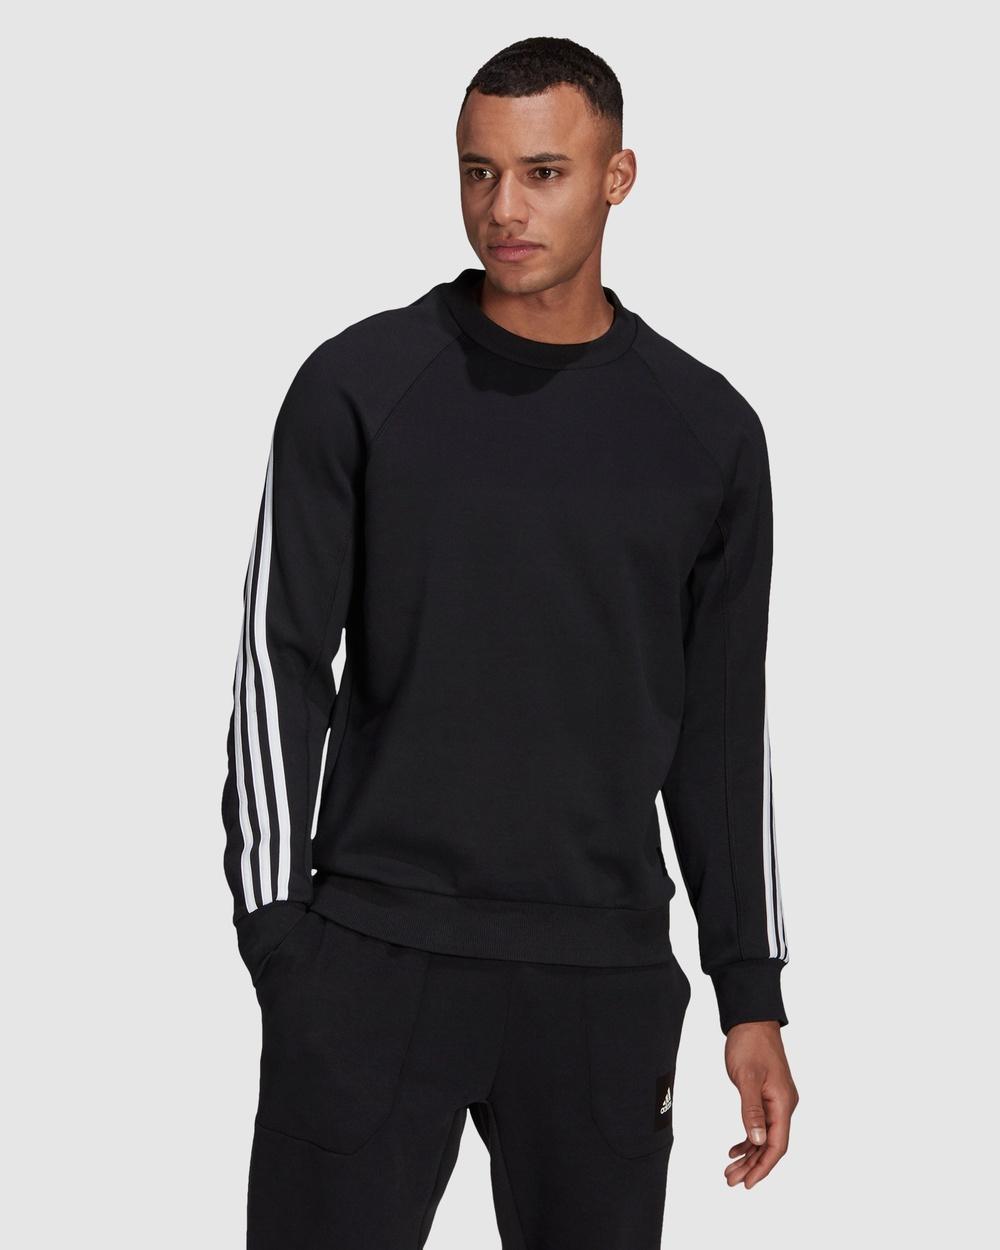 adidas Performance Sportswear 3 Stripes Sweatshirt Jumpers & Cardigans Black 3-Stripes